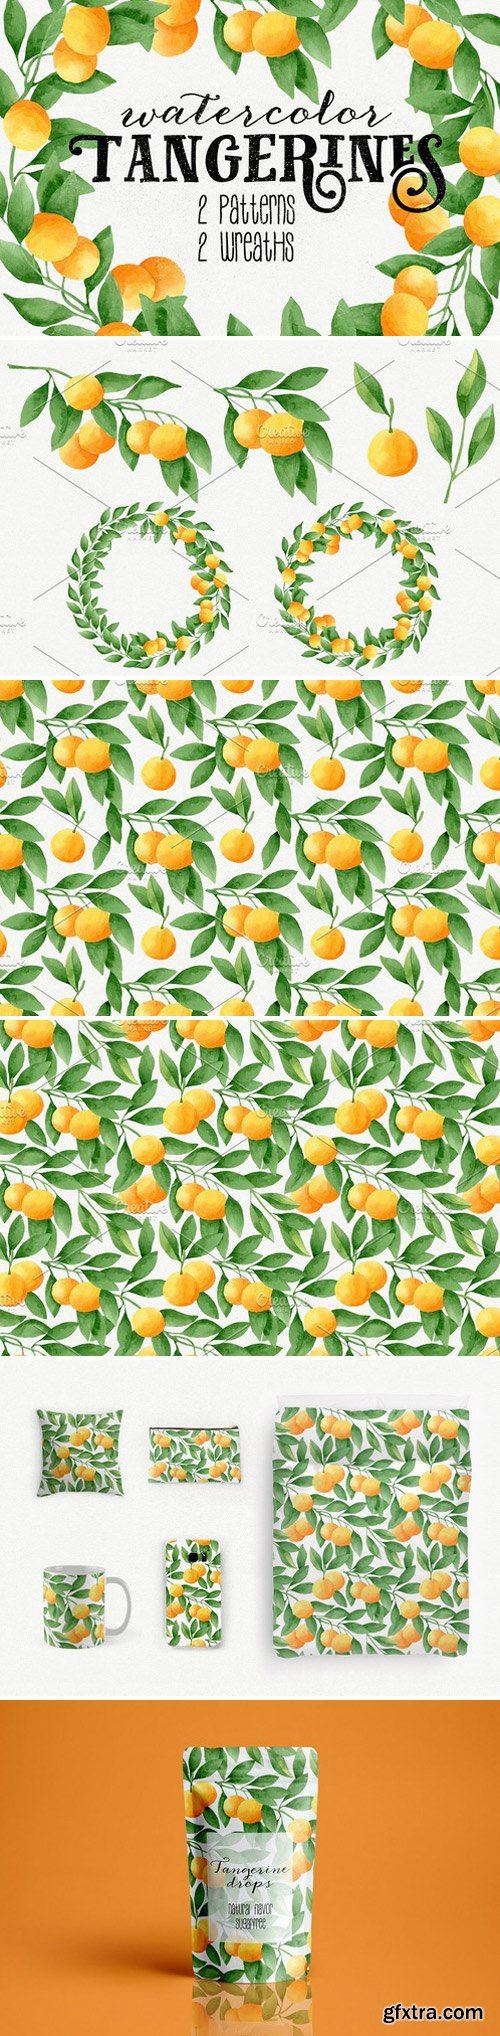 CM - Watercolor Tangerines + Patterns 1492110